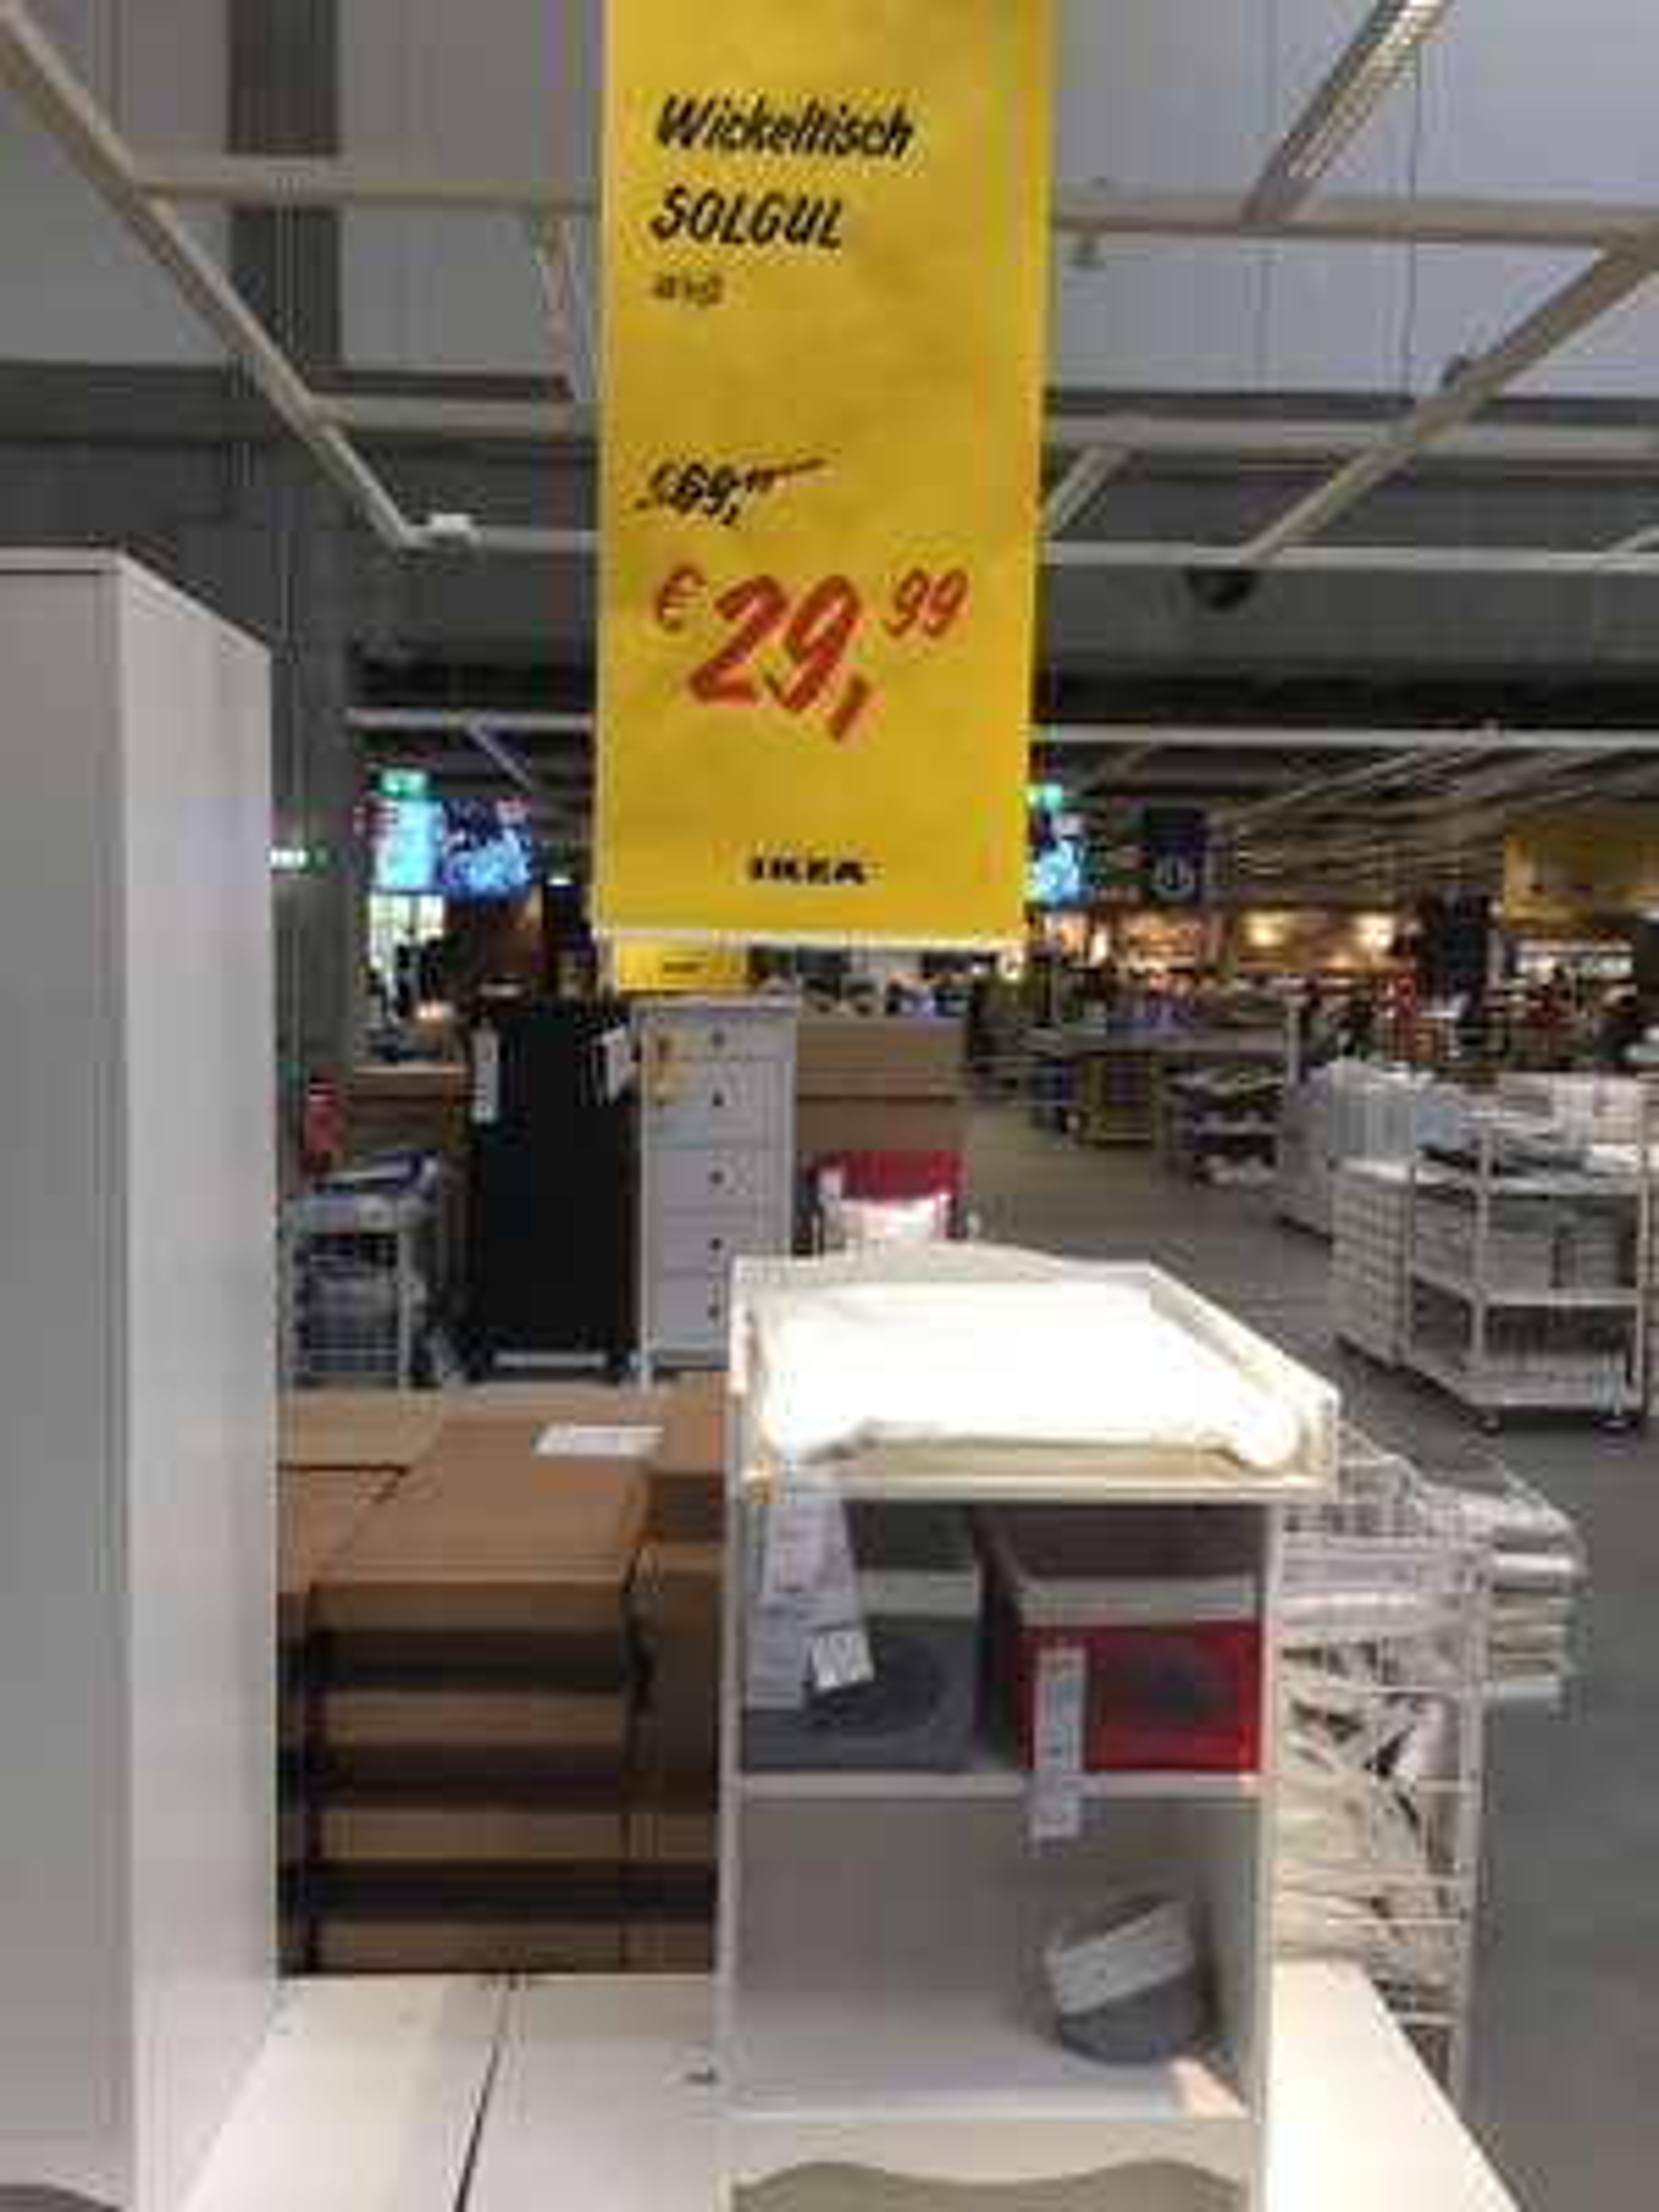 Ikea Solgul Wickeltisch Weiß